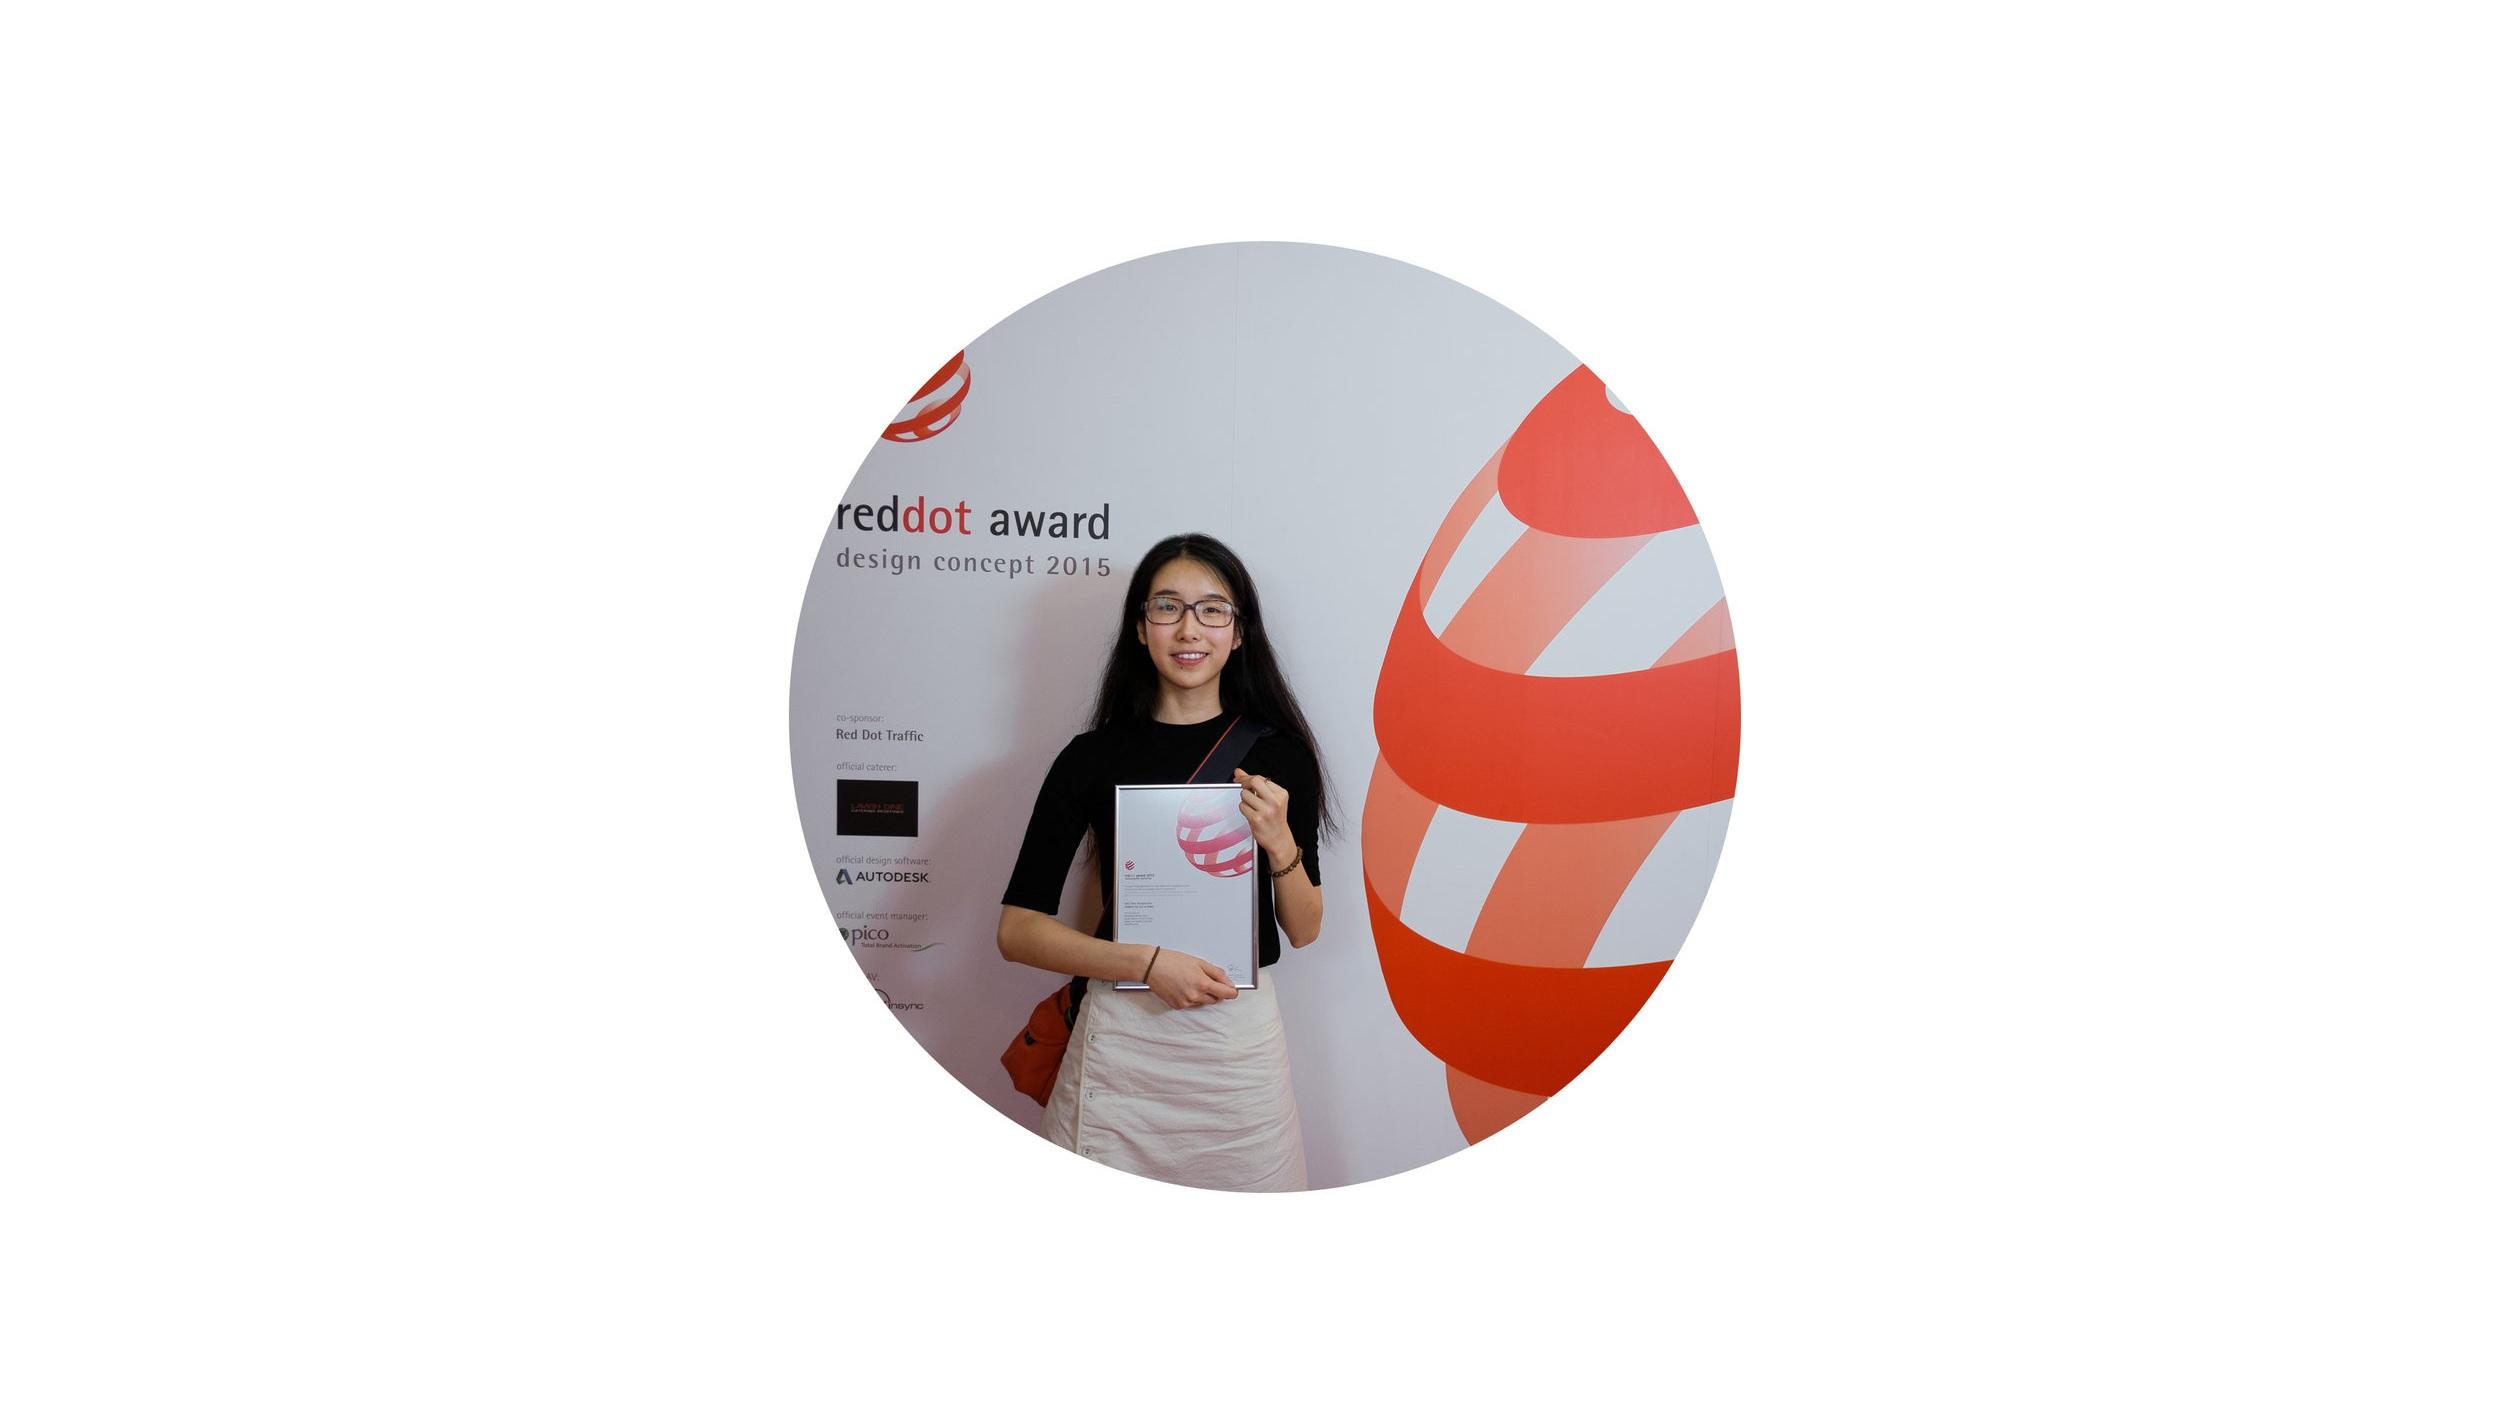 Reddot Design Award - 2015